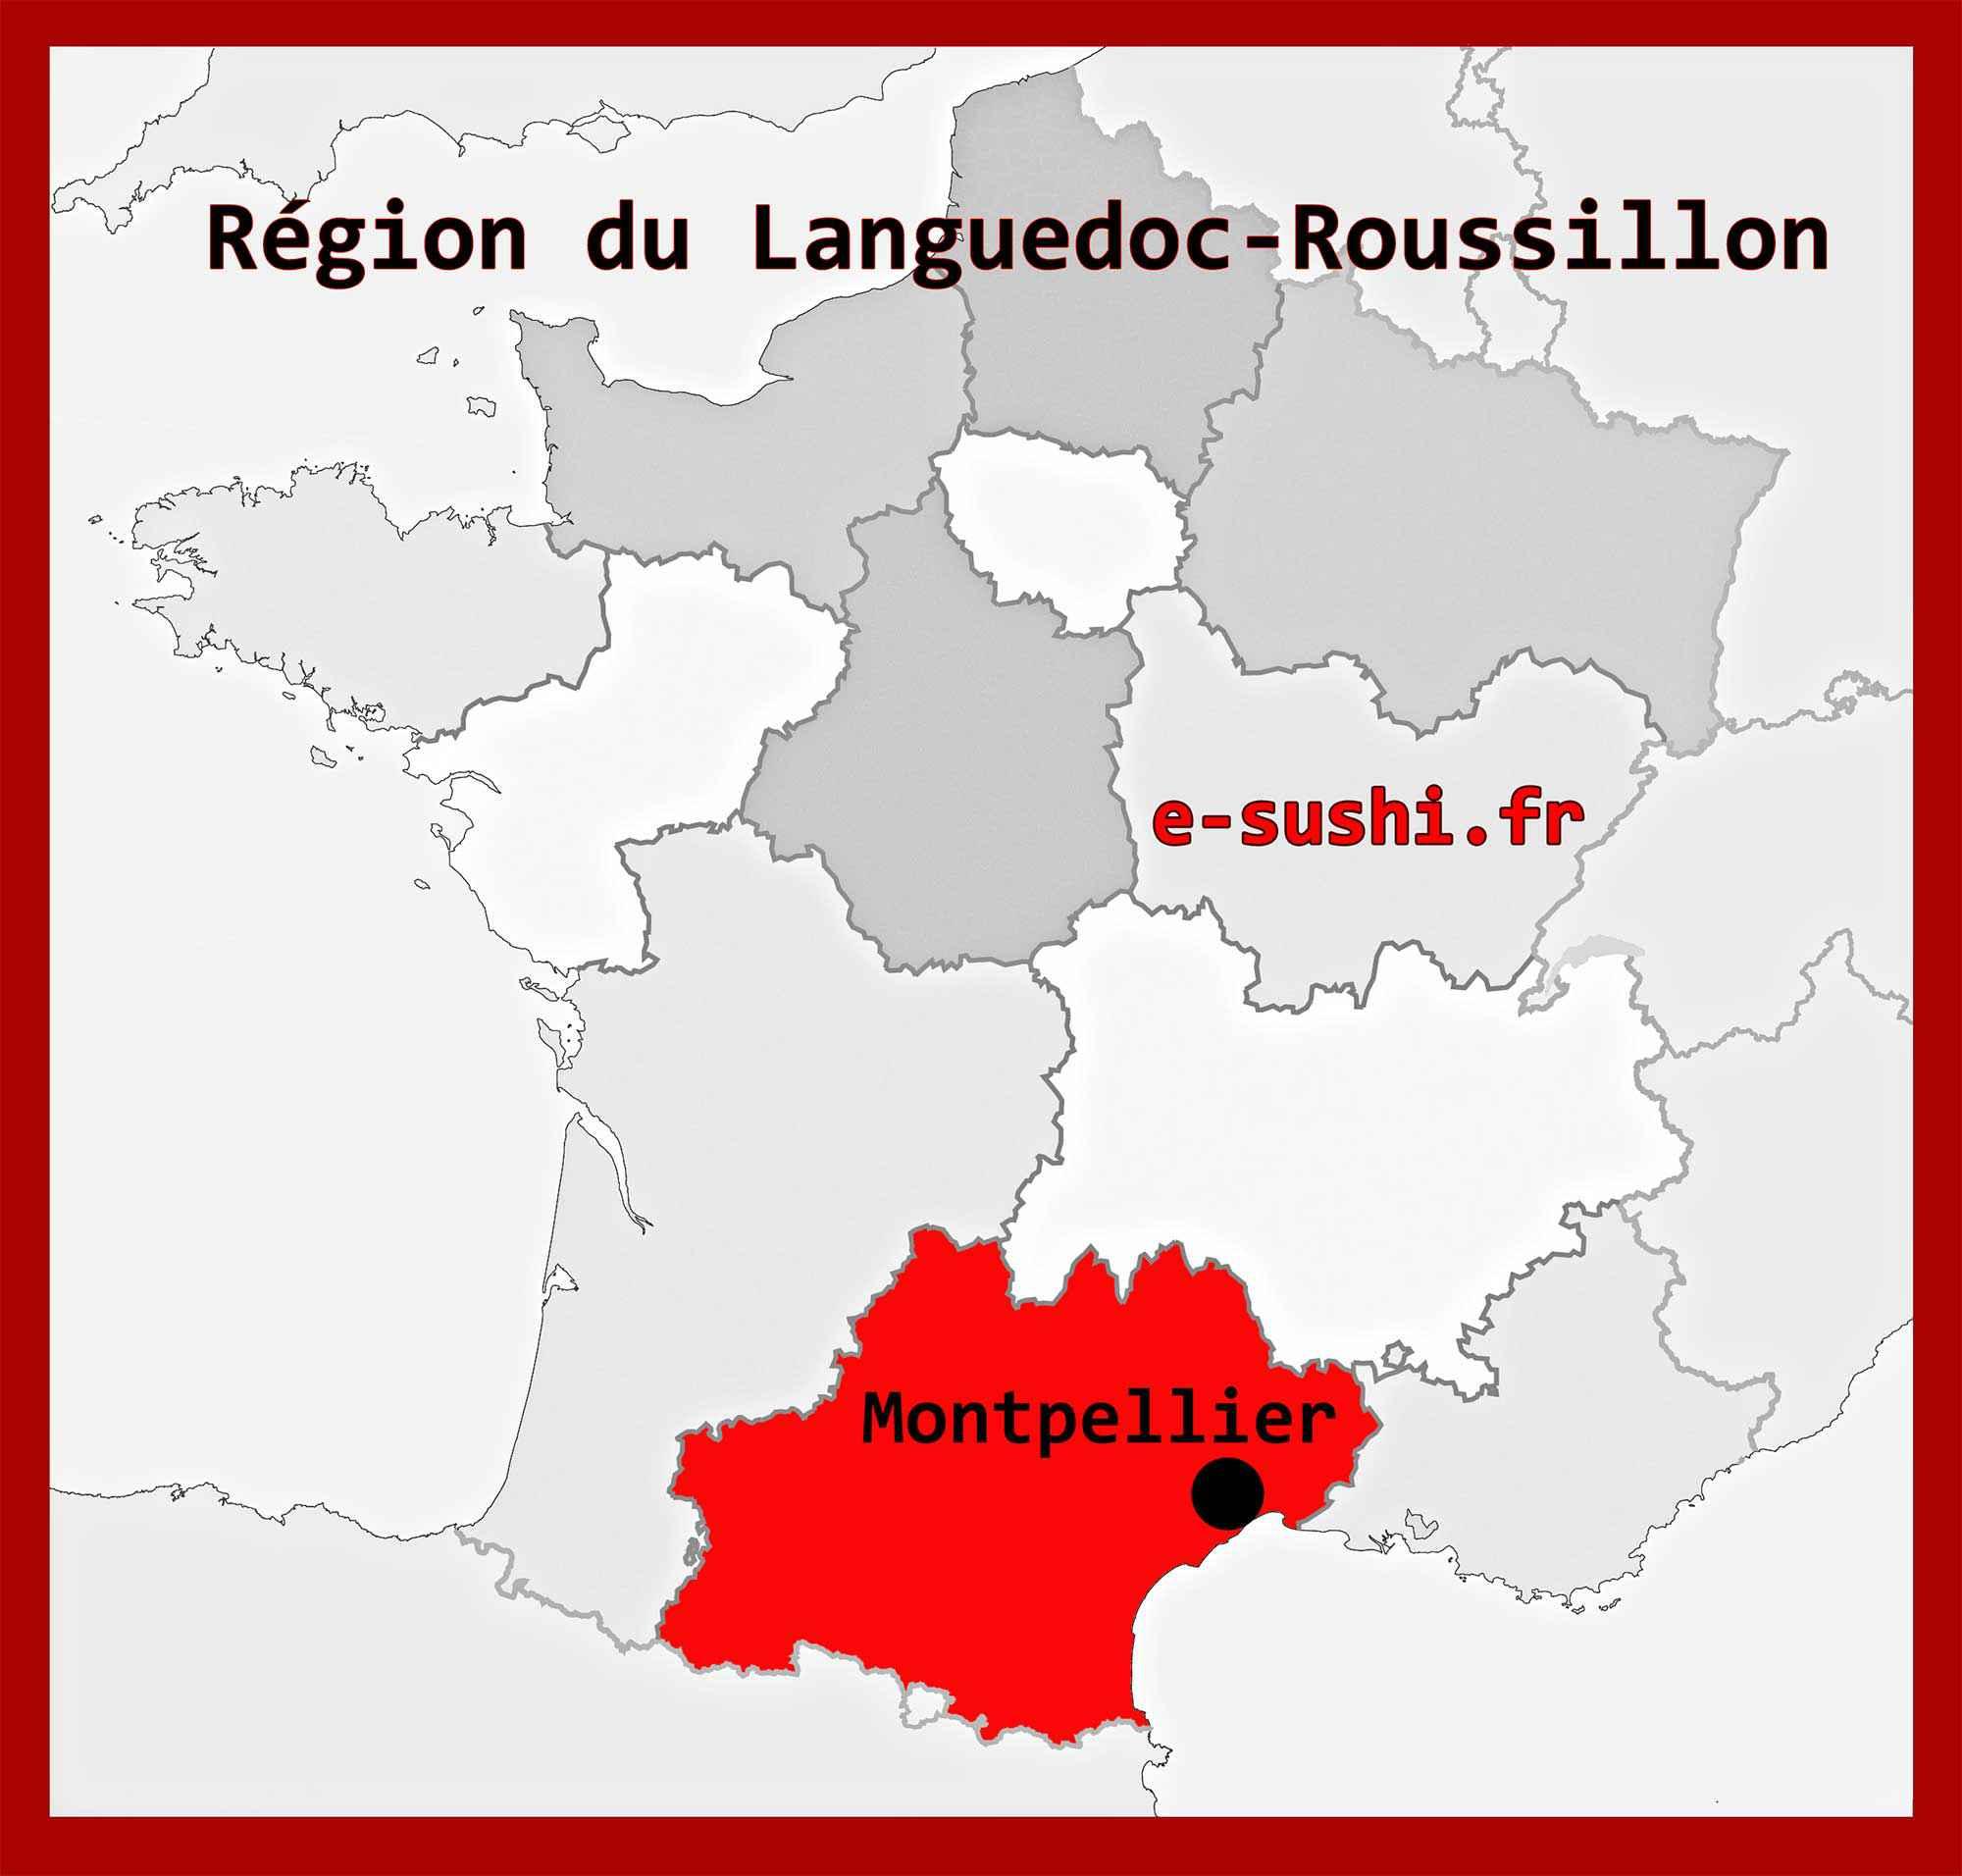 montpellier region languedoc roussillon